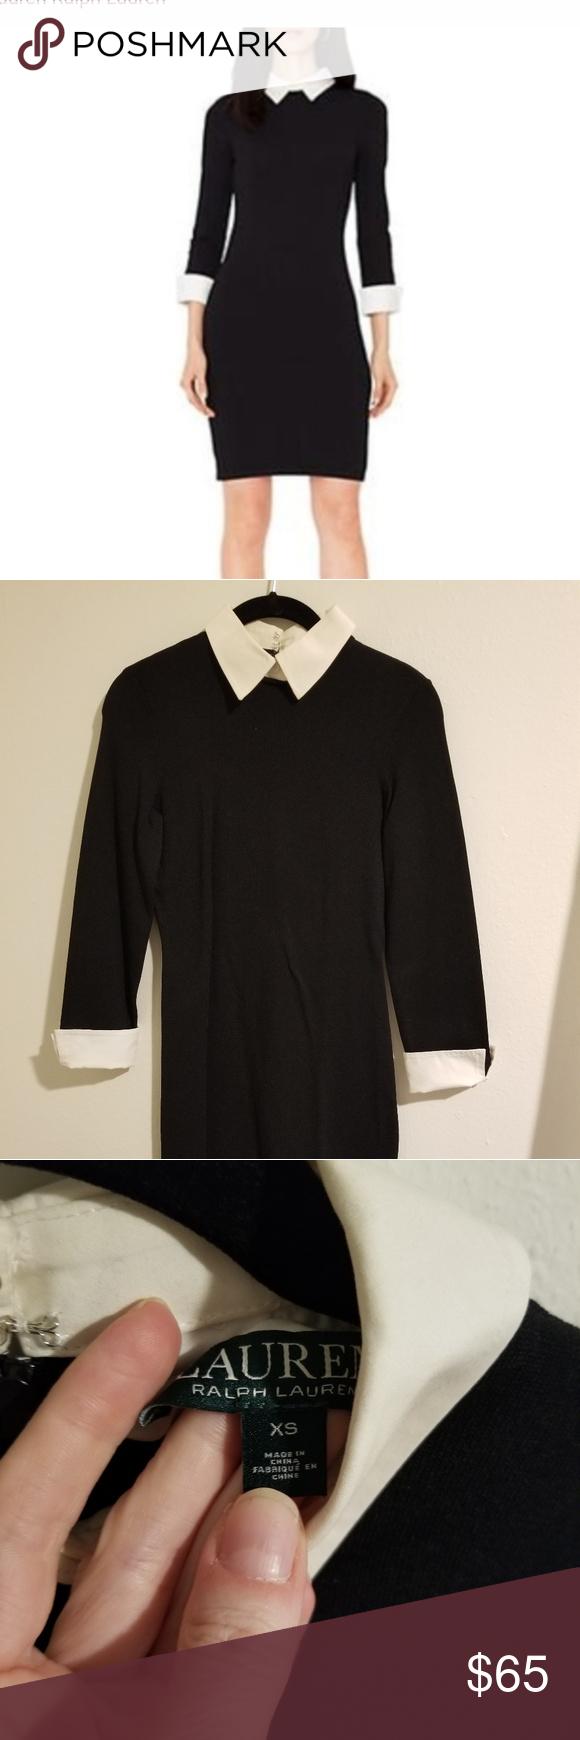 Lauren By Ralph Lauren Black And White Dress Black N White Dress White Dress Clothes Design [ 1740 x 580 Pixel ]